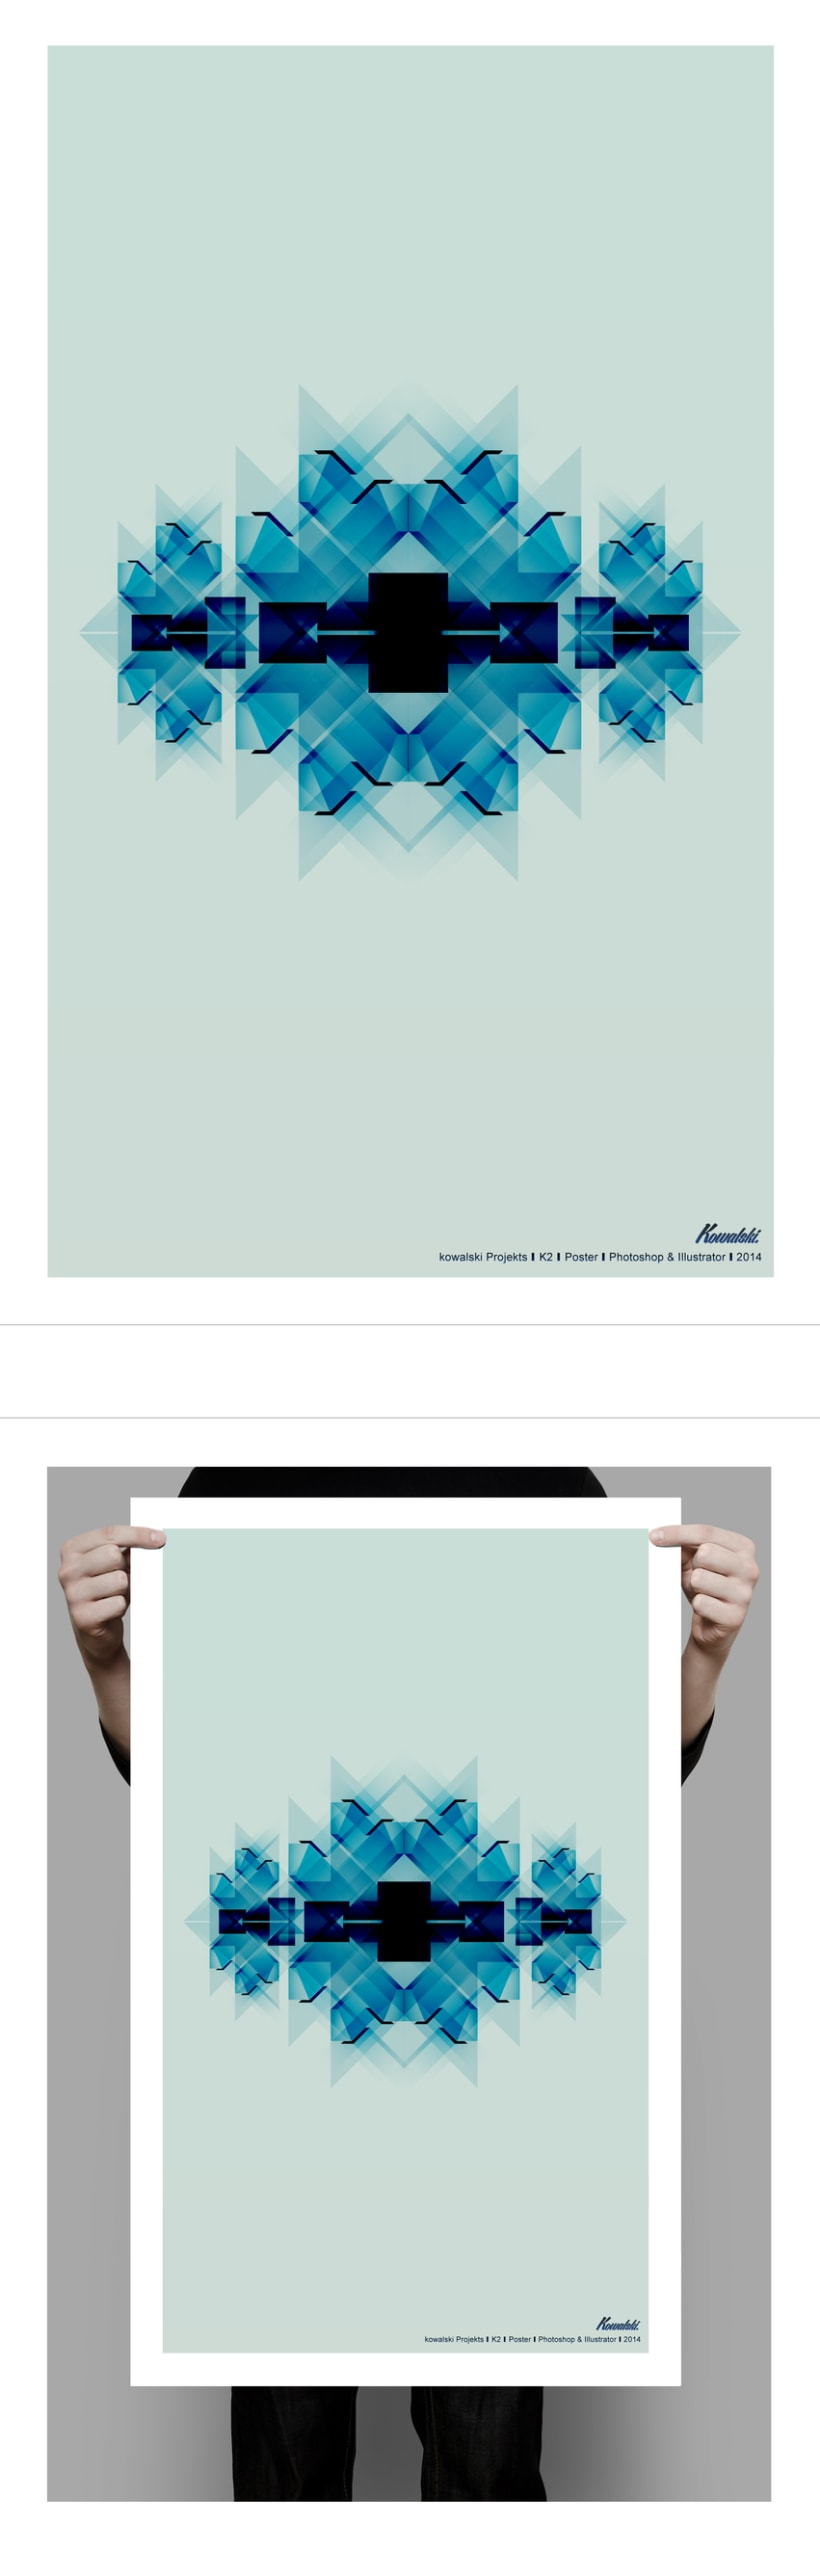 kowalski Projekts / Illustration - K2 -  -1